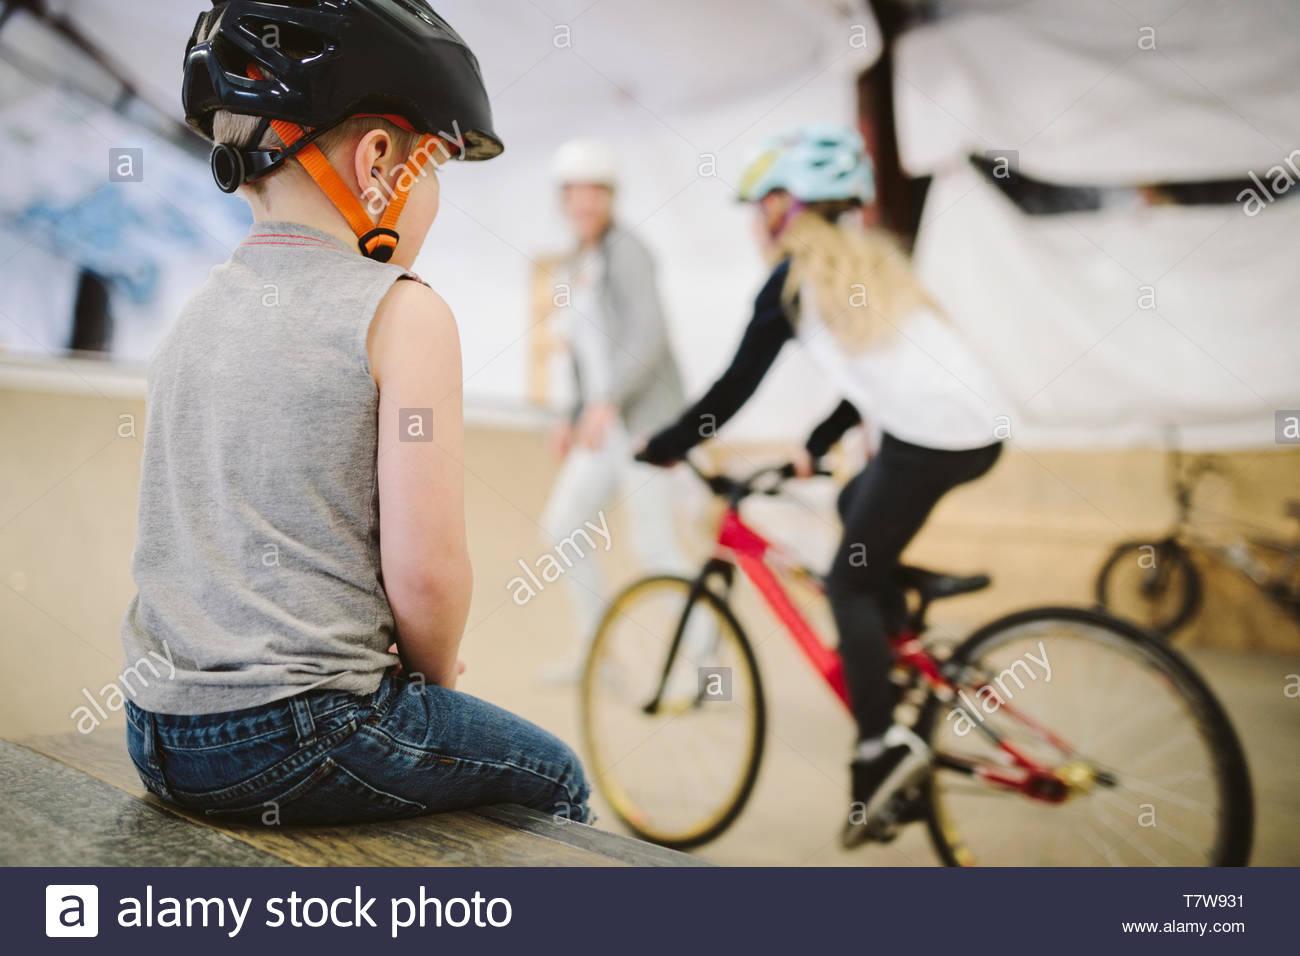 Toddler boy watching sister bike riding at indoor skate park Stock Photo